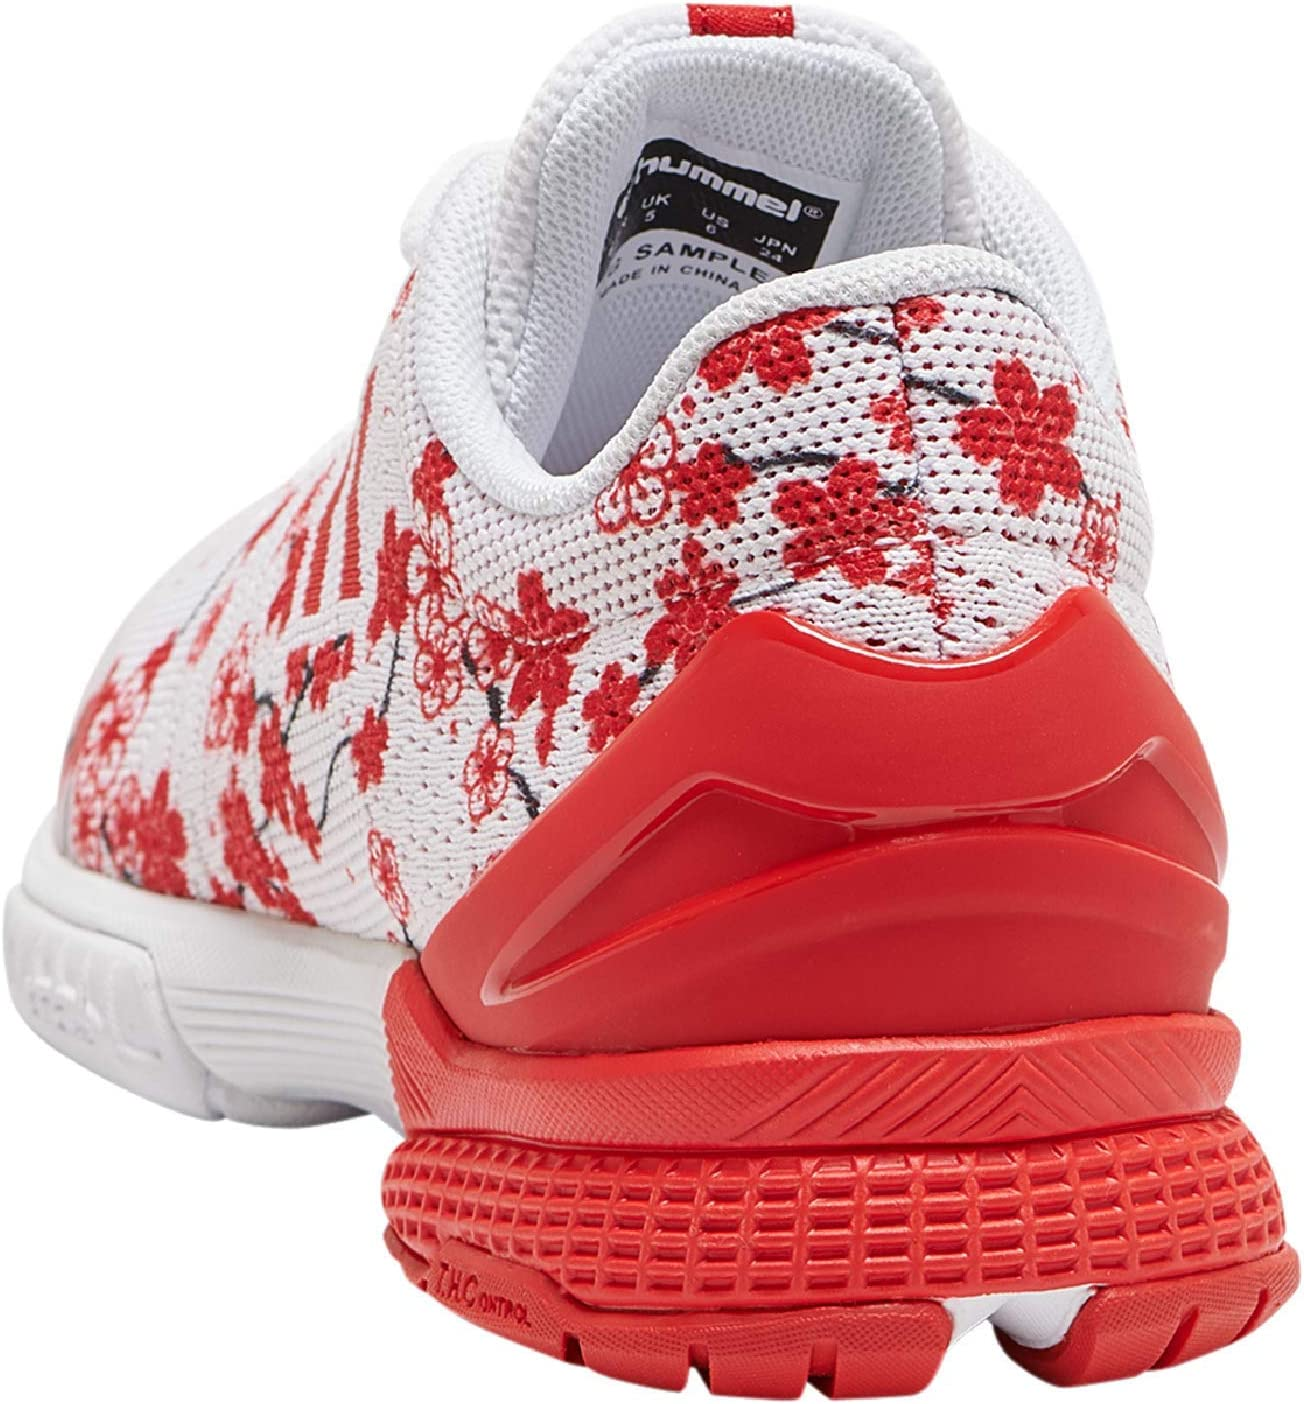 Chaussures femme Hummel Aero Engineered WS Japan